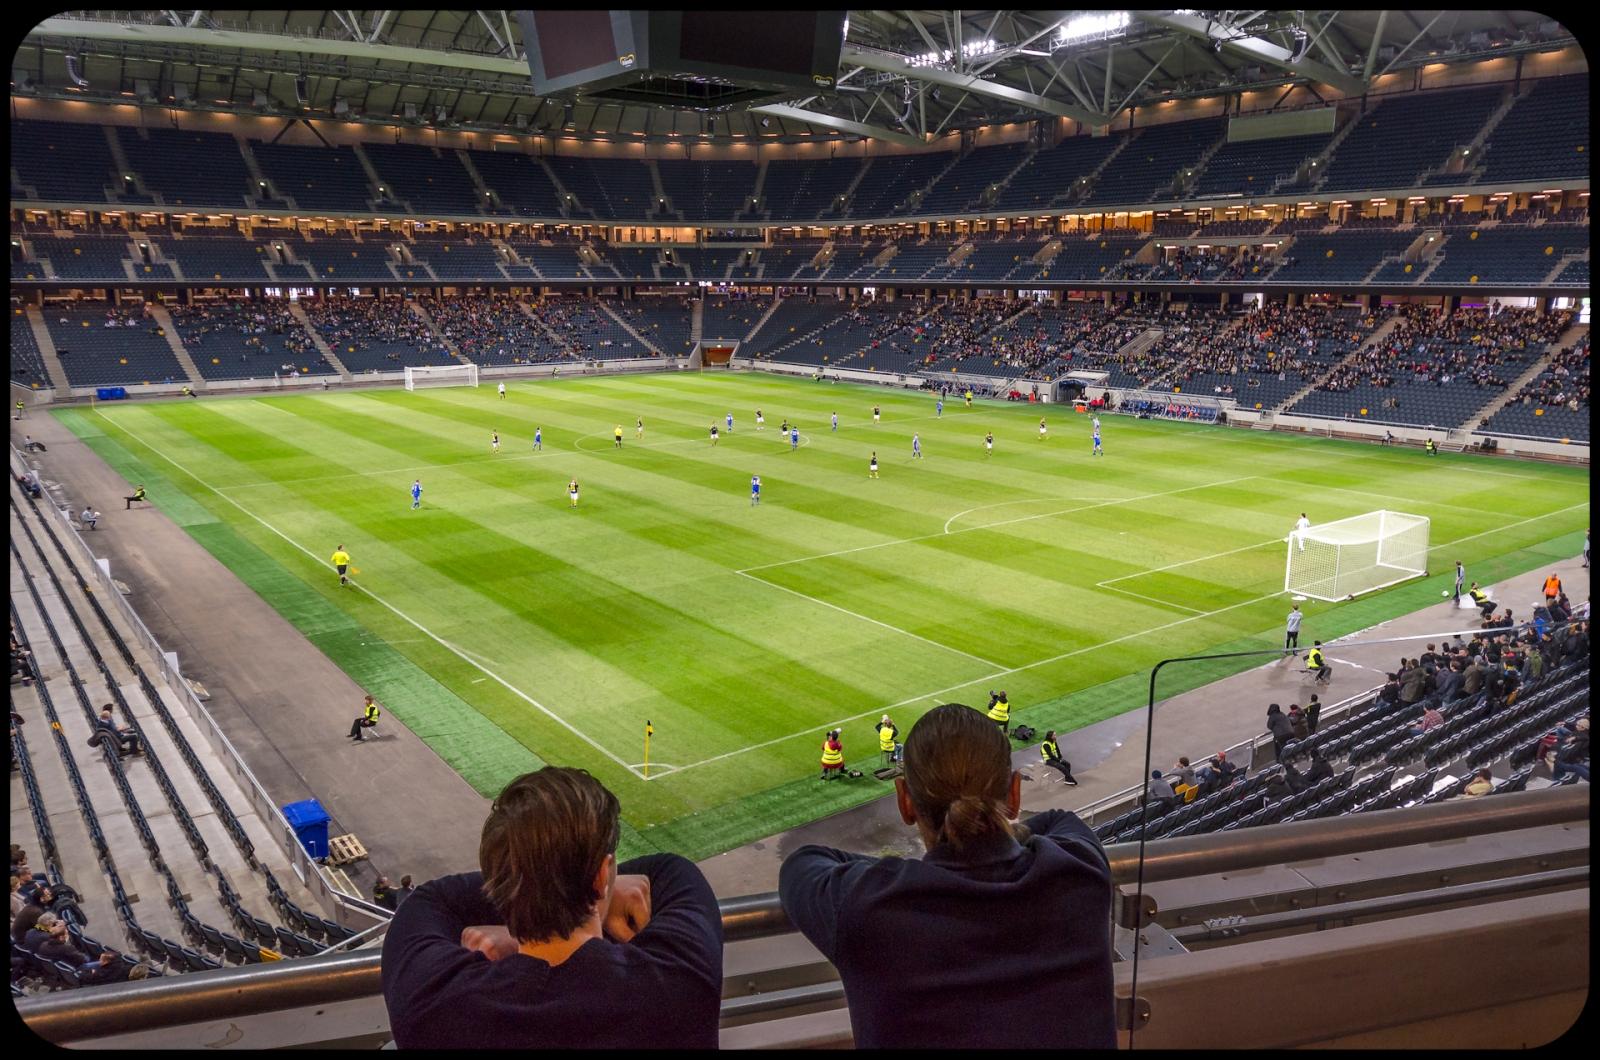 Death Star Arena mot HJK